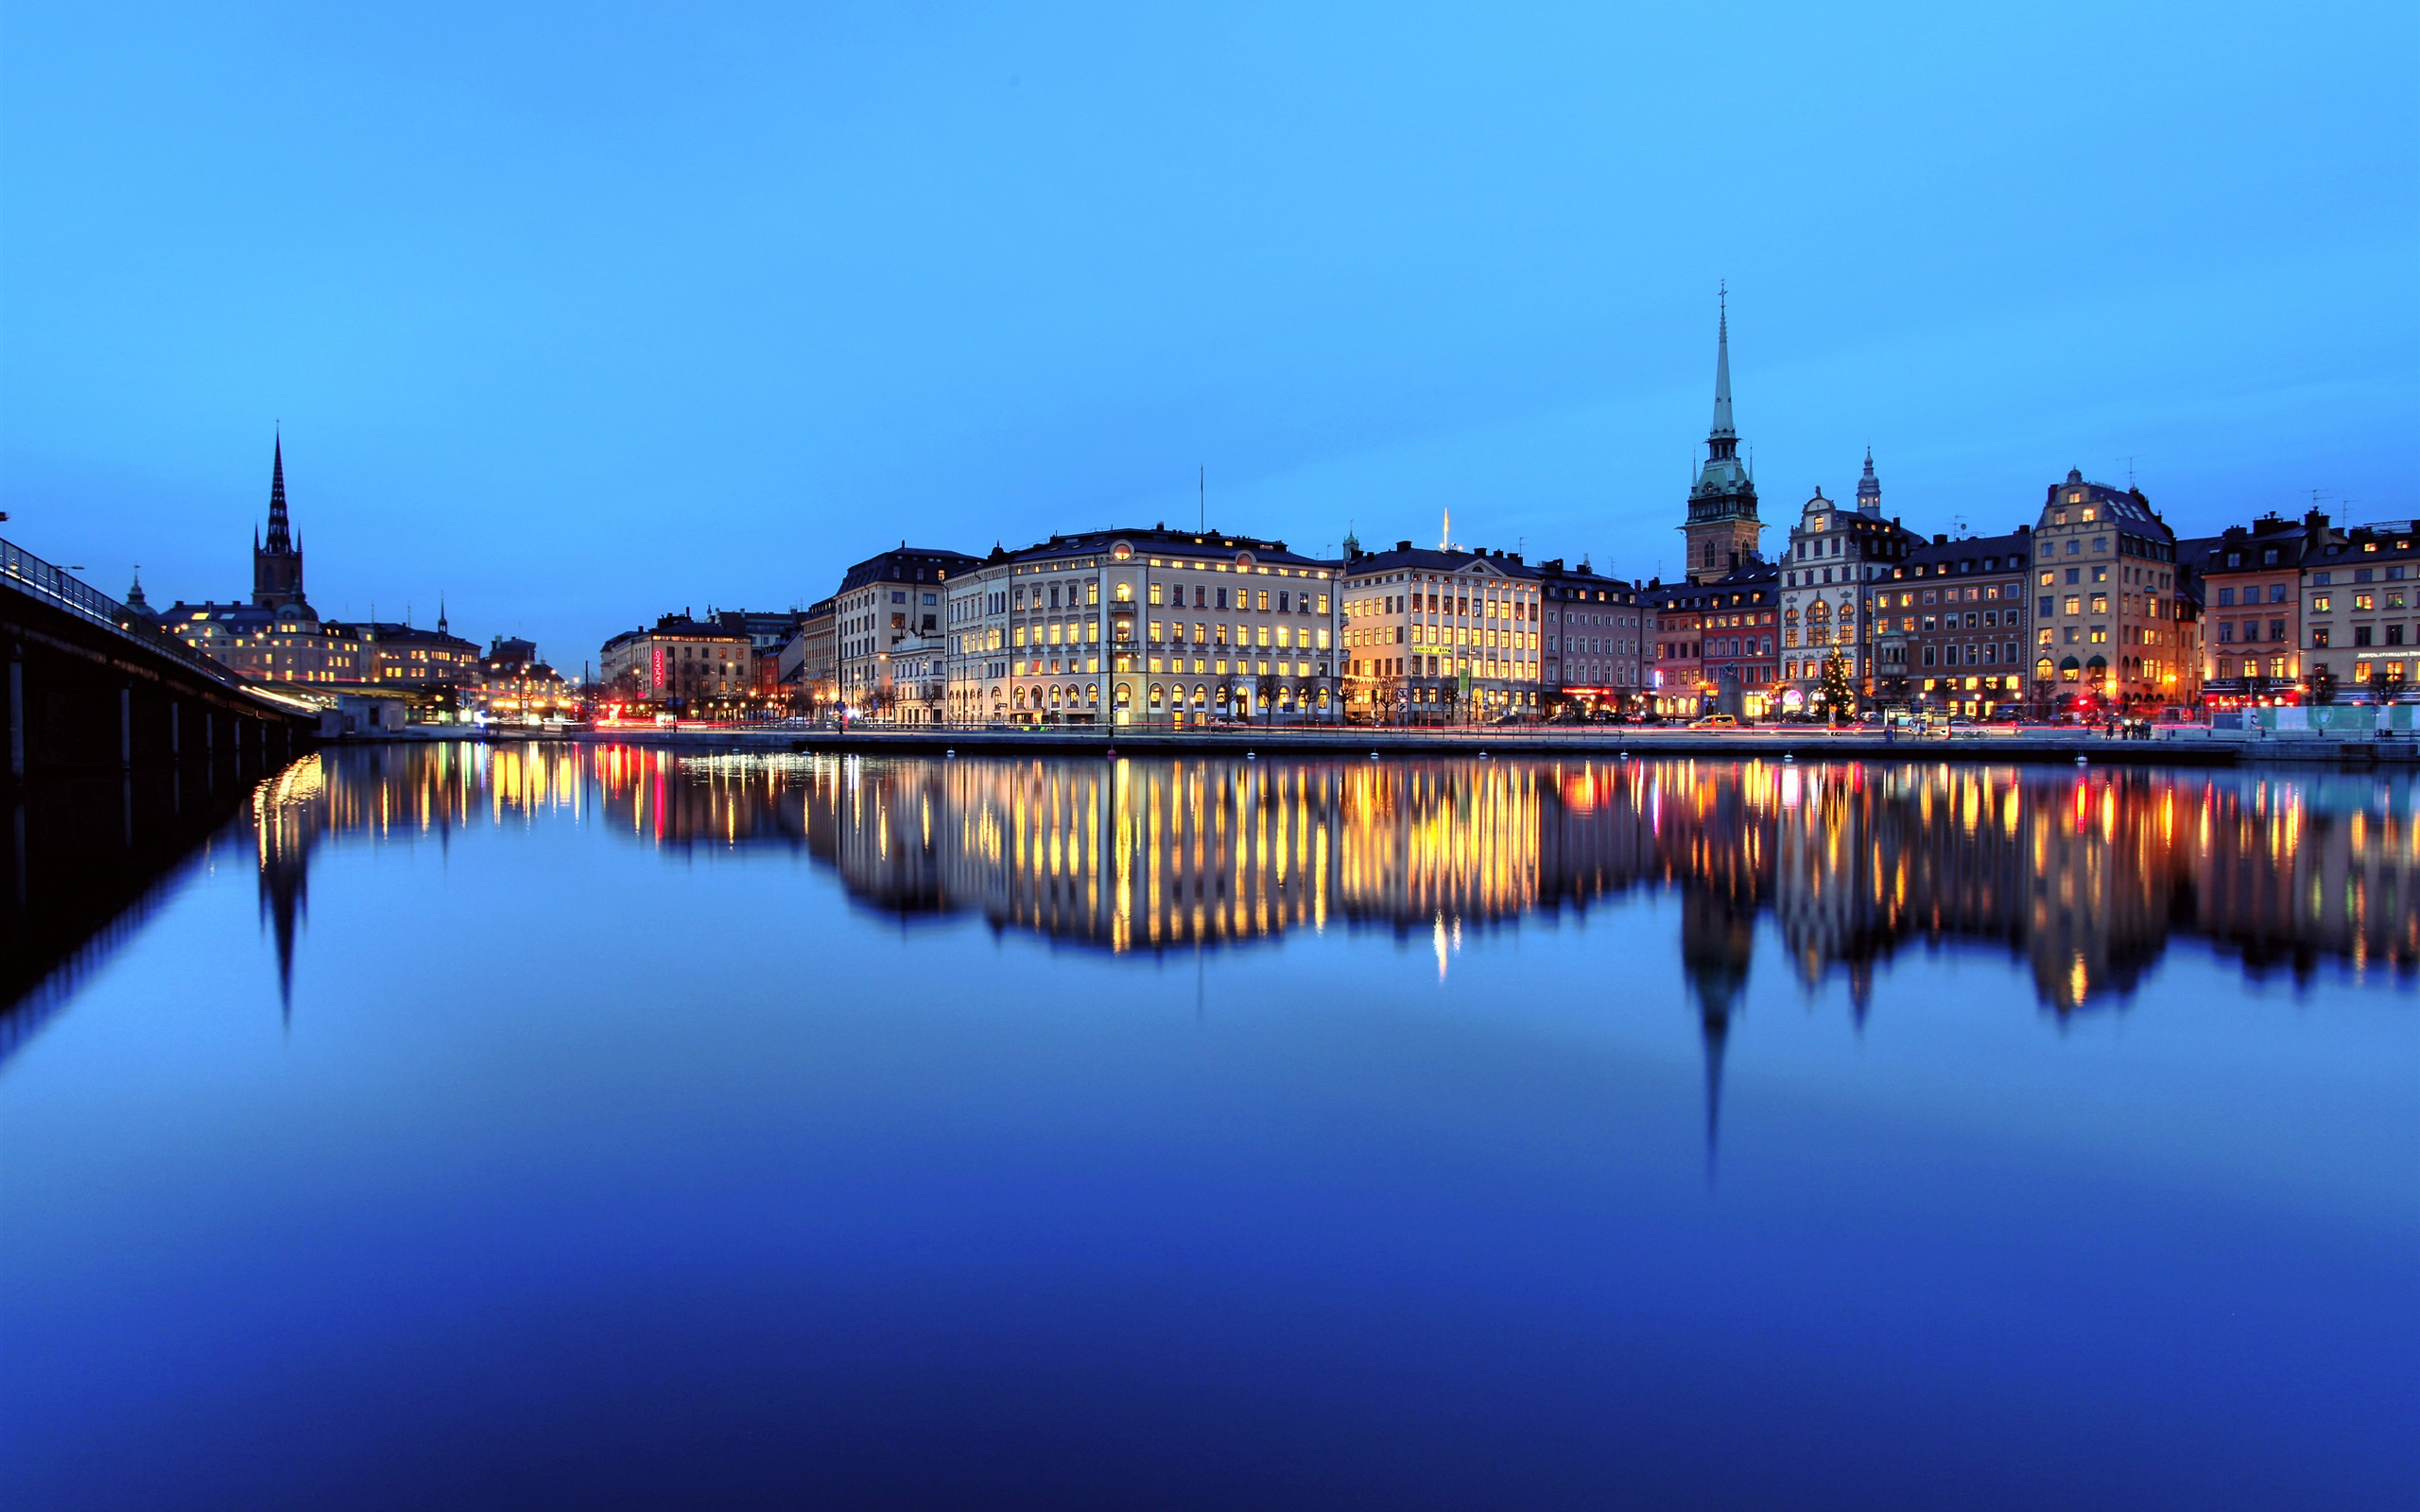 архитектура страны город река Стокгольм Швеция без смс